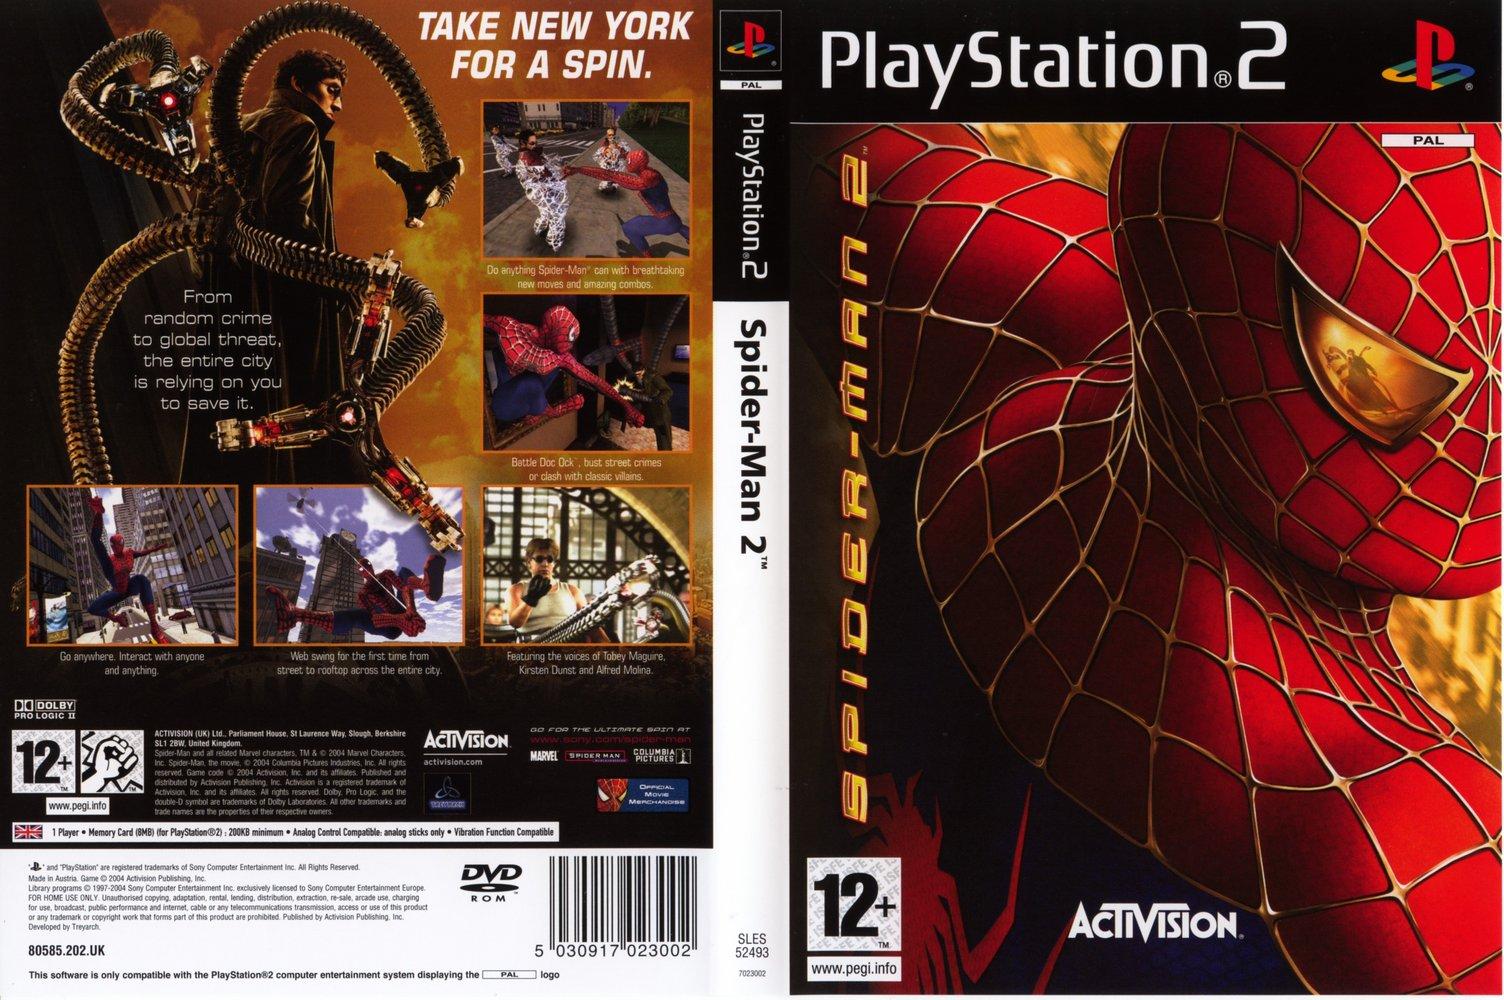 http://3.bp.blogspot.com/-XZbEt8P3iZM/TcOuZIfvQ3I/AAAAAAAAAVs/YhADd7tz3Zk/s1600/Spiderman+2.jpg